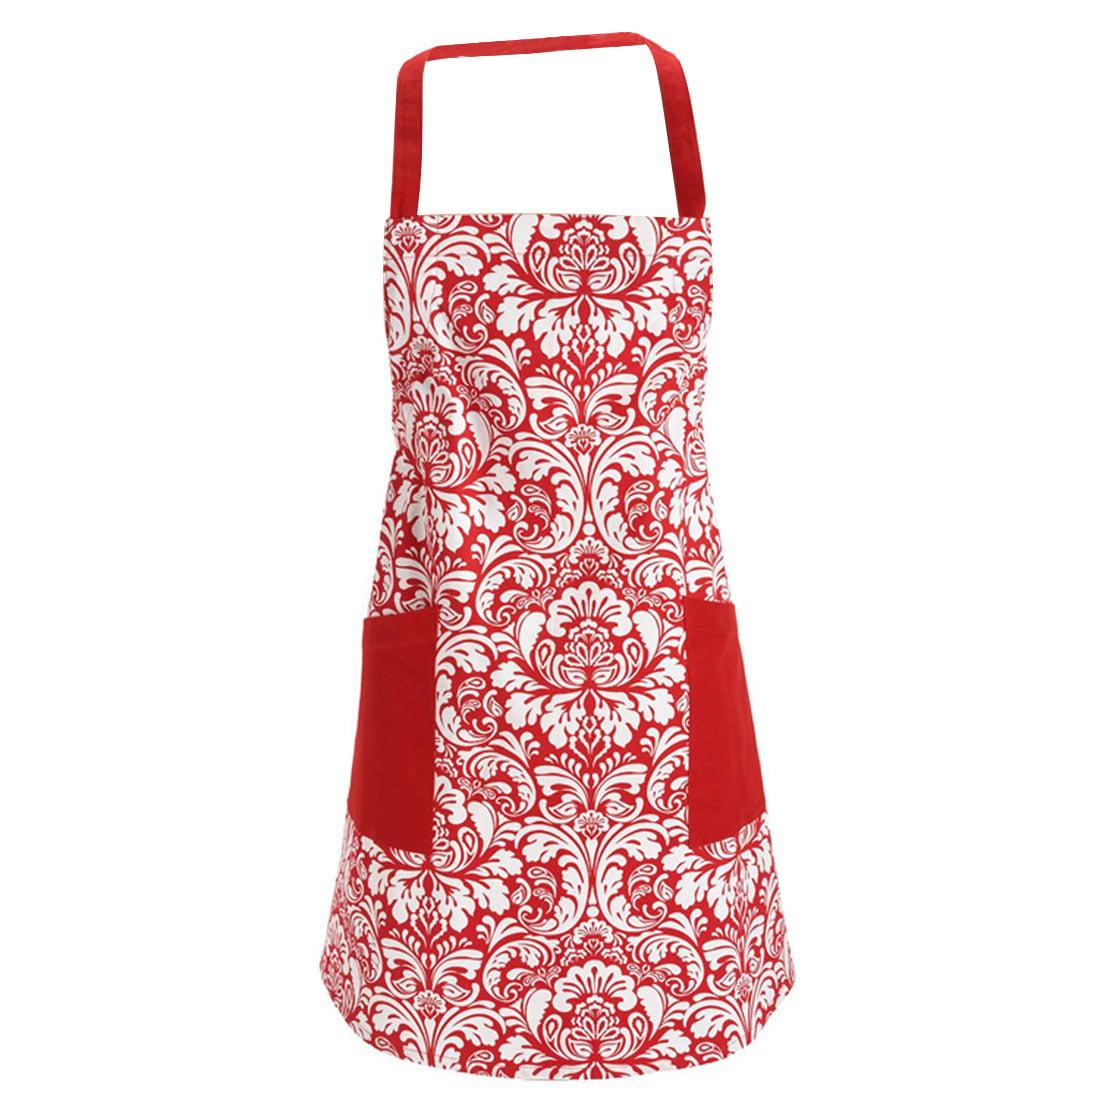 Women Flower Prints Kitchen Restaurant Bib Cooking Pocket Apron Dress Red